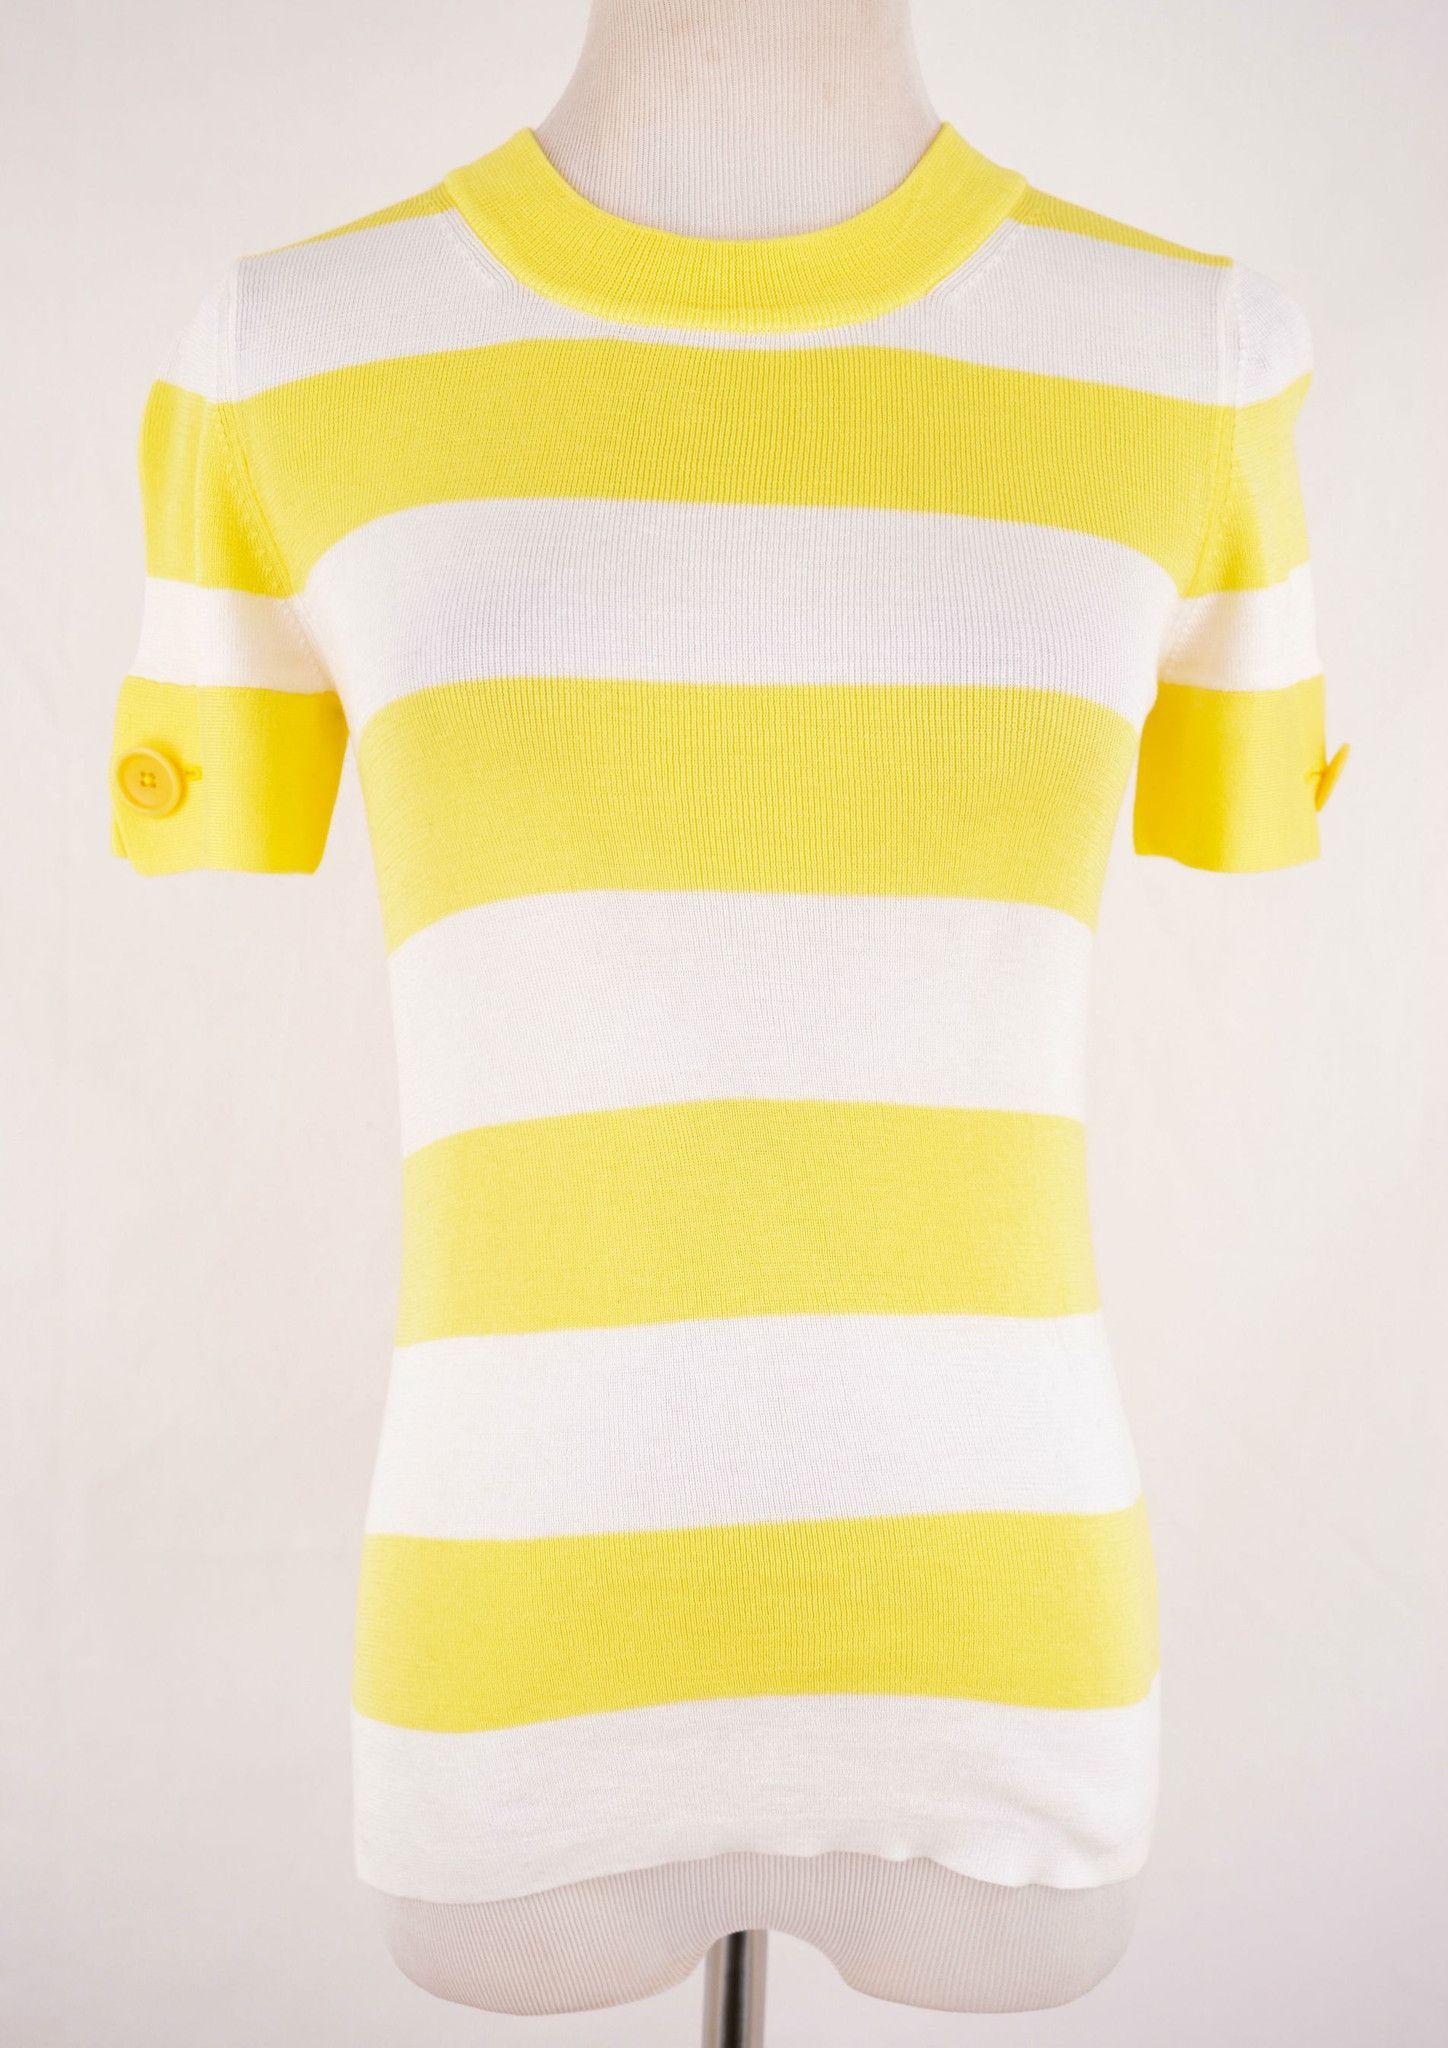 Banana Republic Striped Yellow Shirt Size S